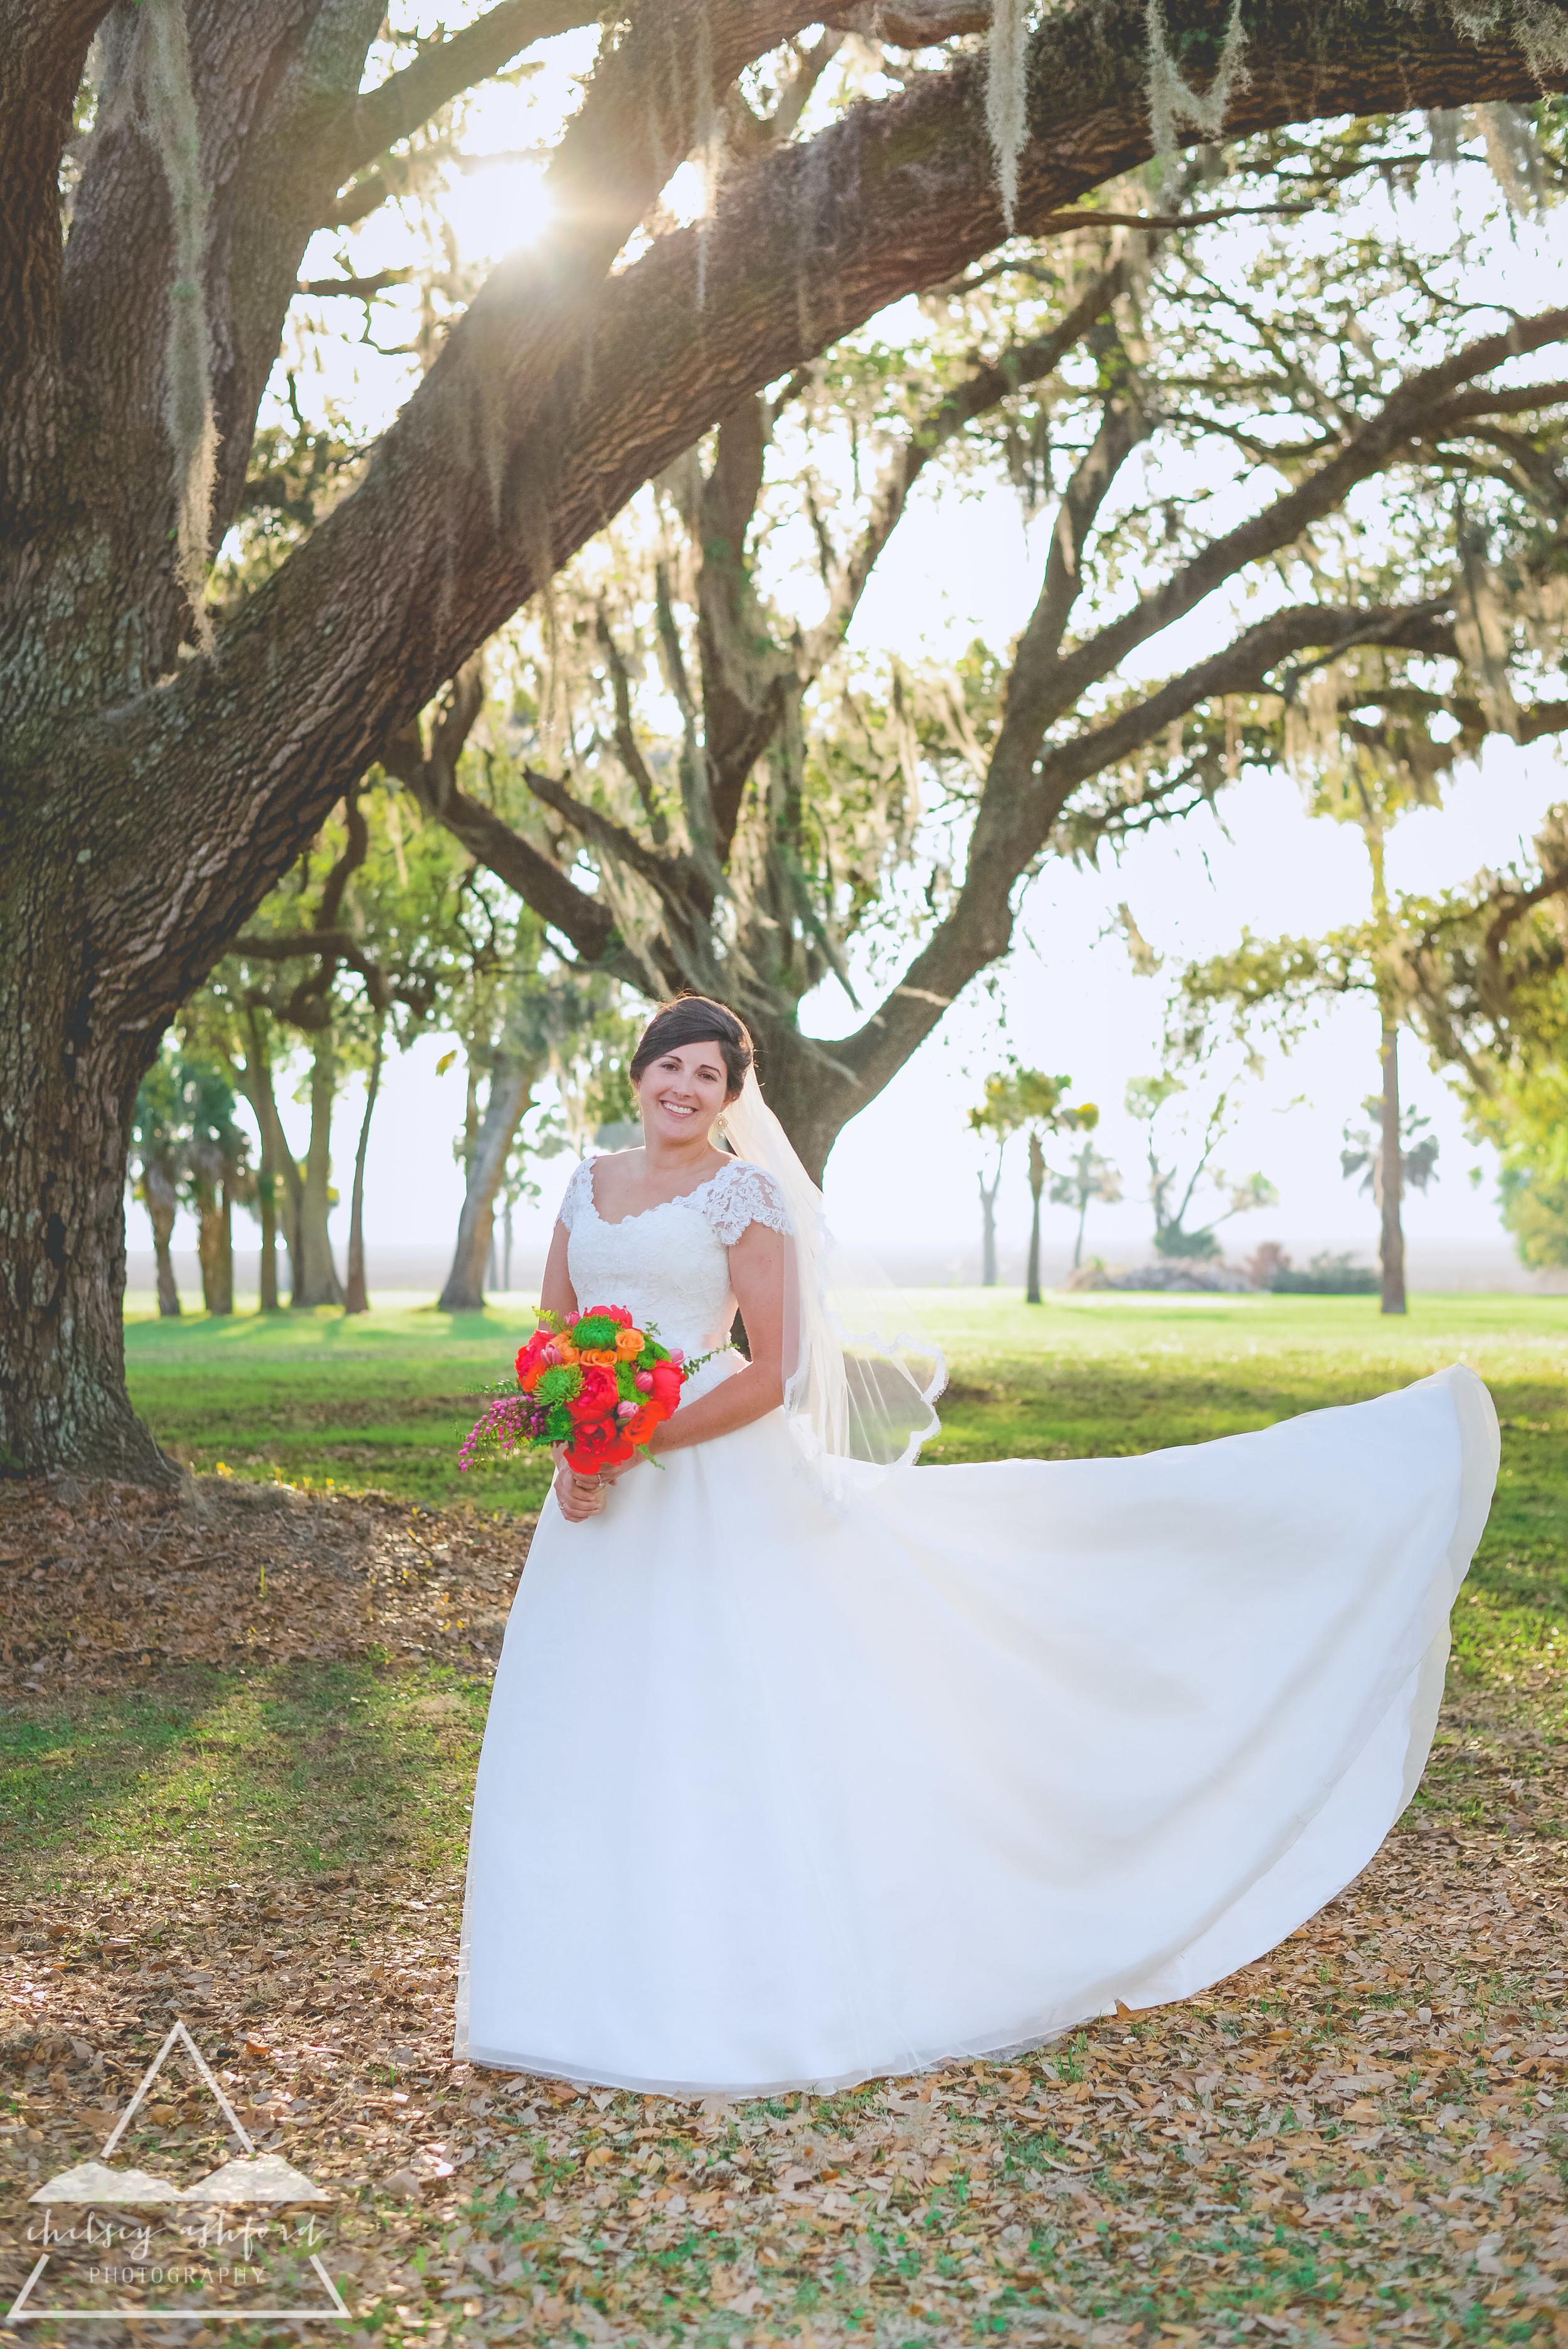 Sylvia_bridals_web-20.jpg